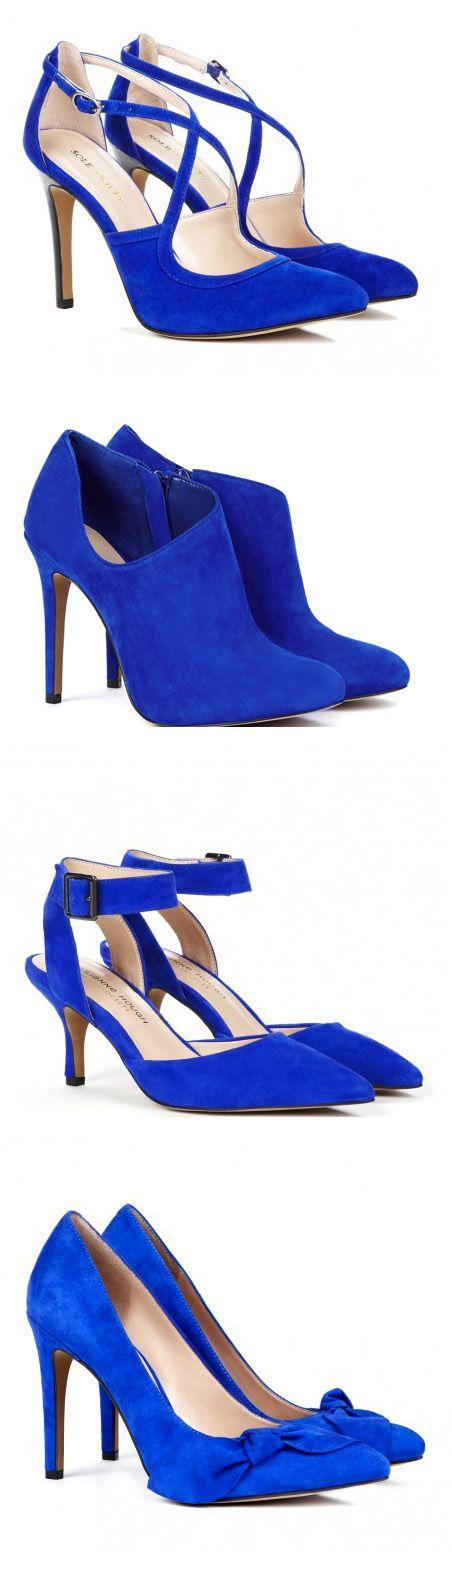 Boots, Shoes, Cobalt blue heels